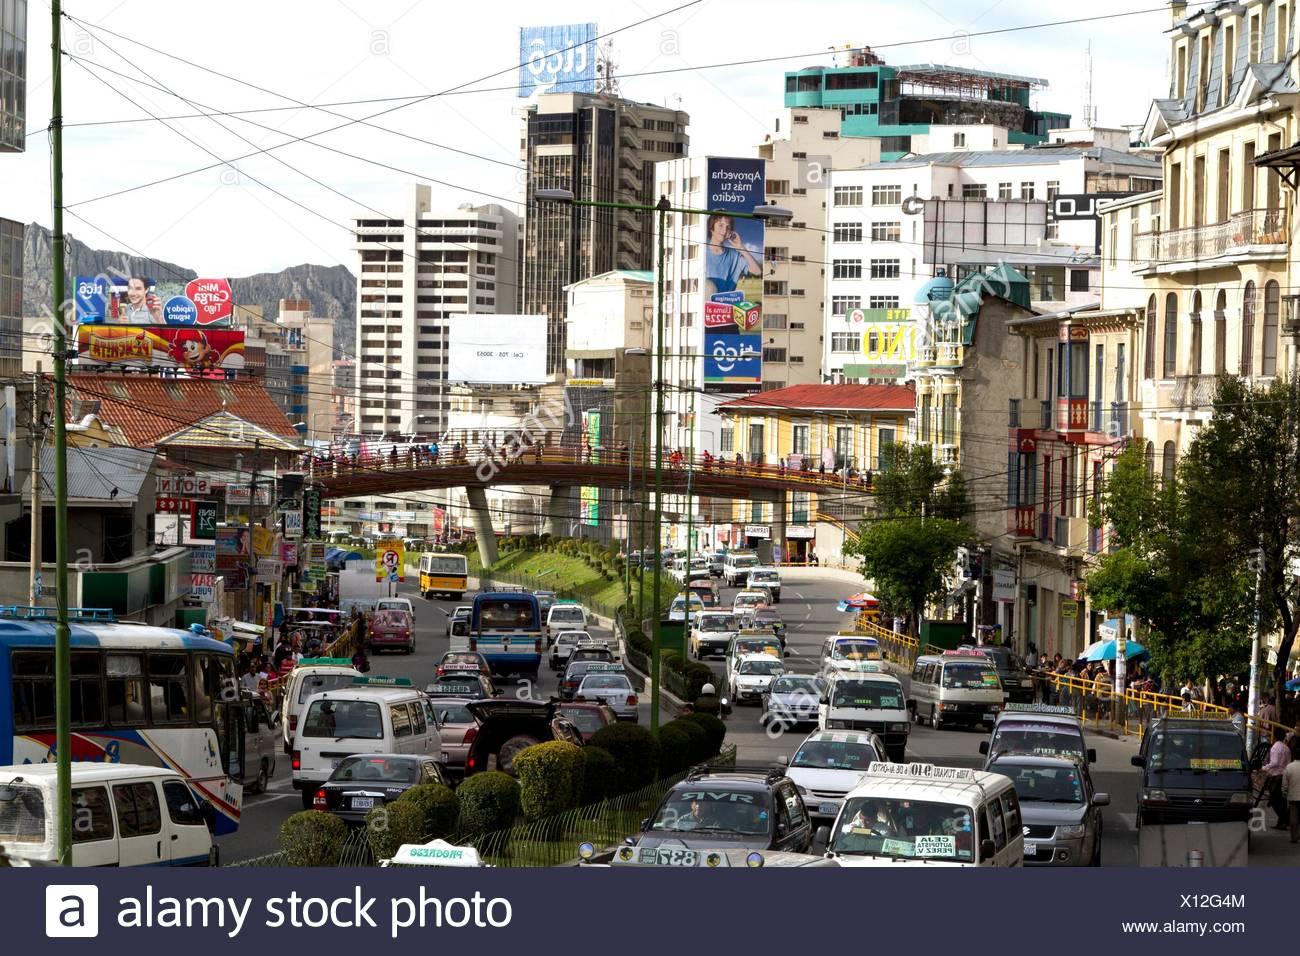 Bolivia La Paz Av Mariscal Santa Cruz Stock Photo Alamy